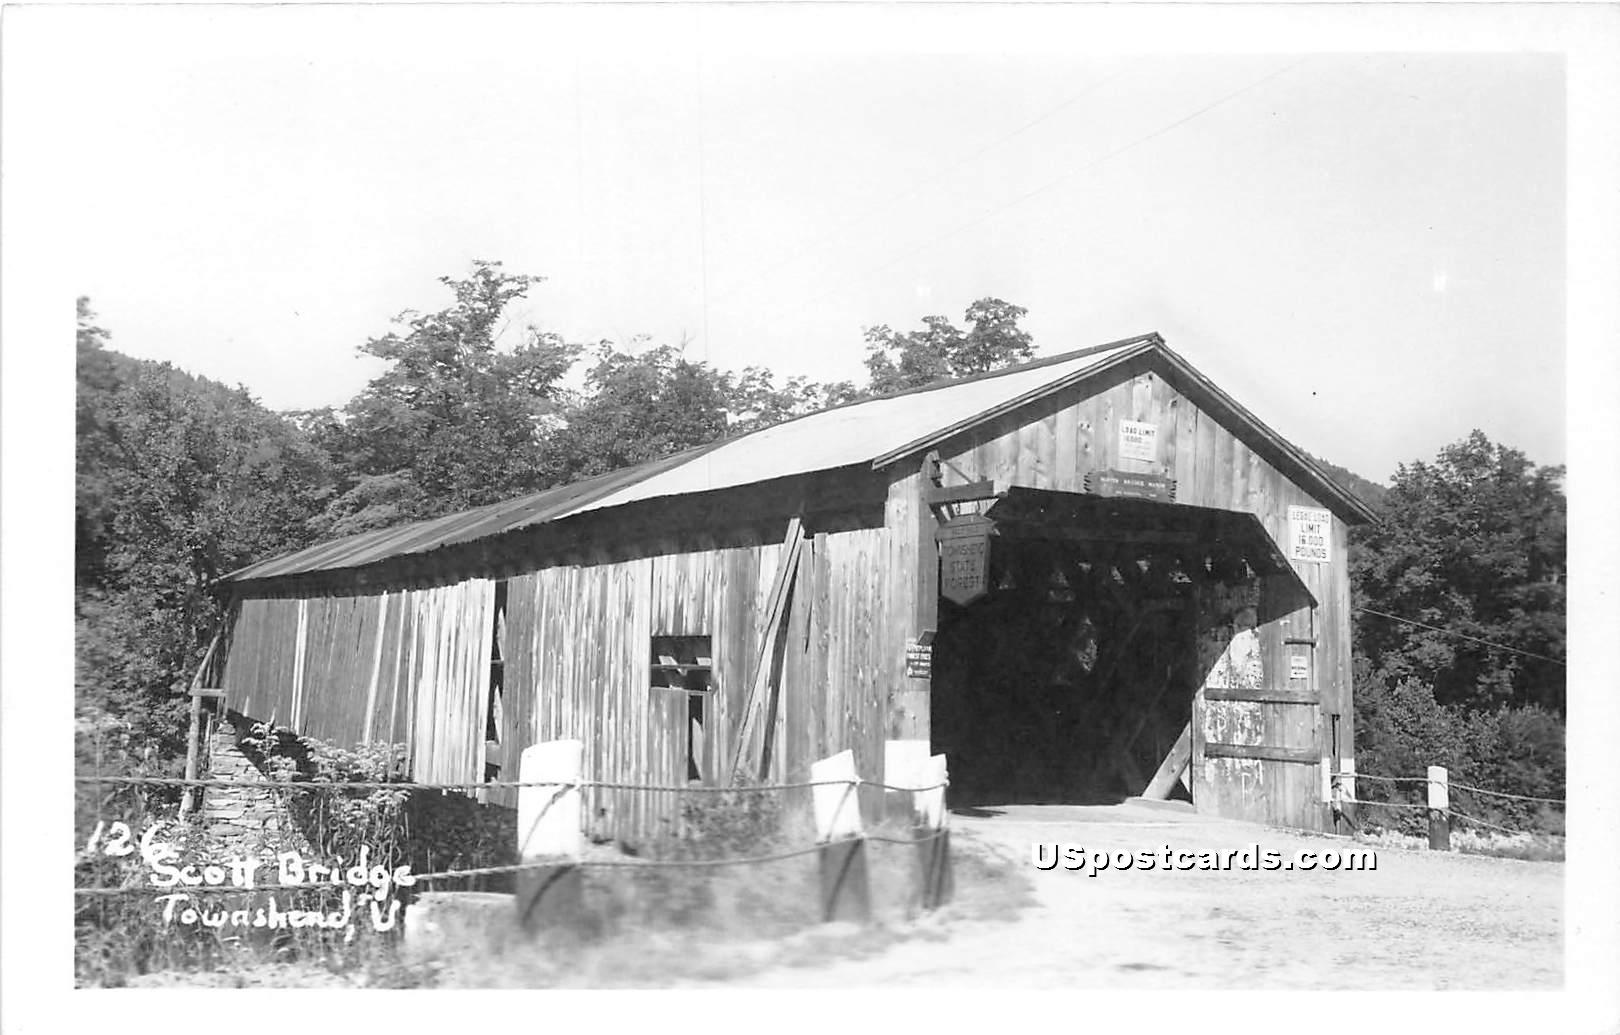 Scott Bridge - Townshend, Vermont VT Postcard